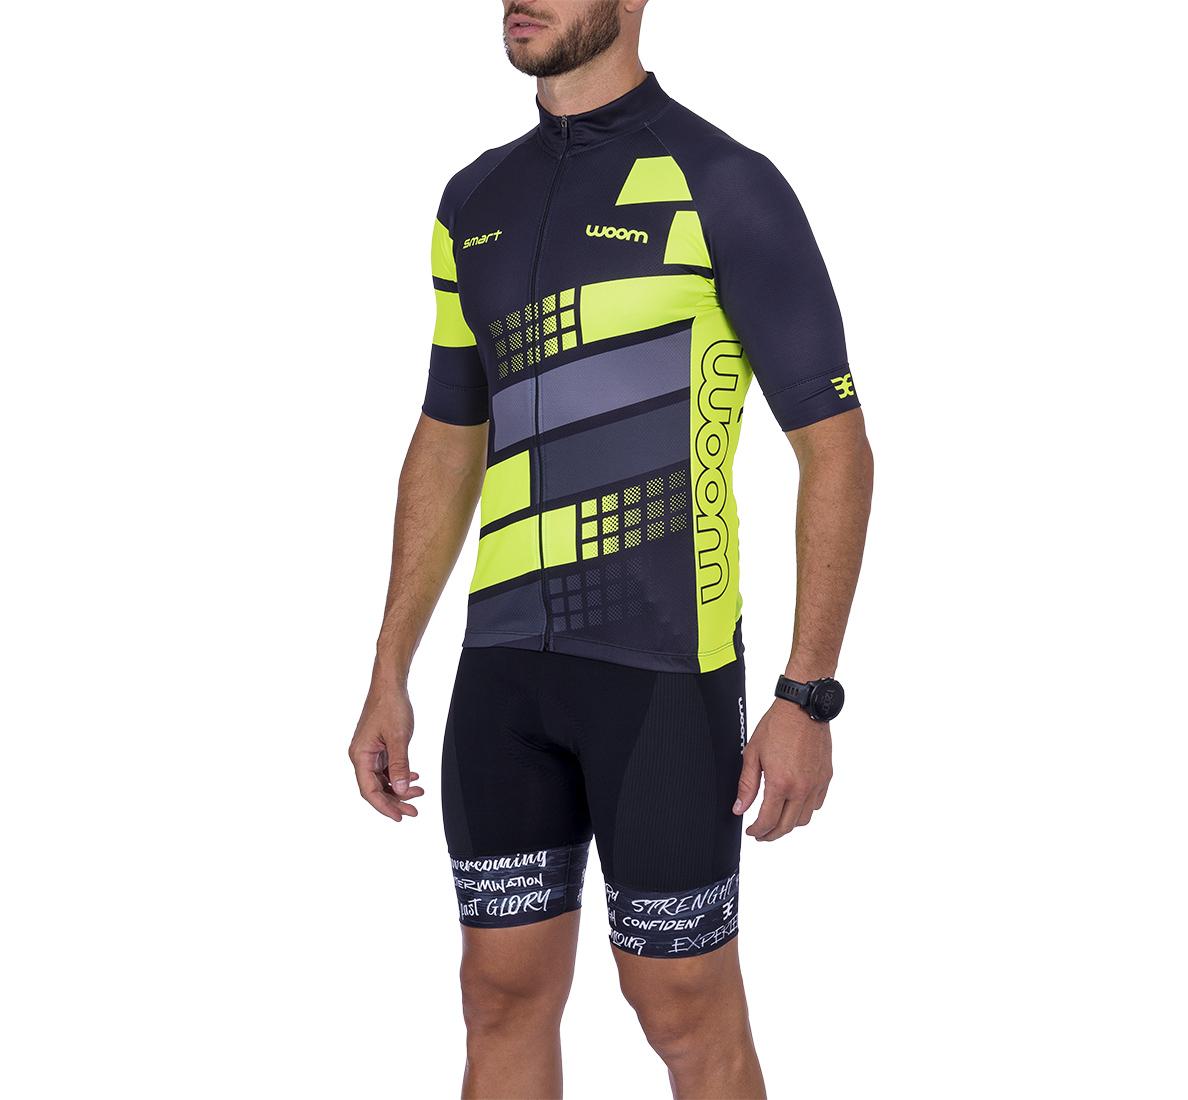 Camisa Ciclismo Smart Shine Masc - 2021